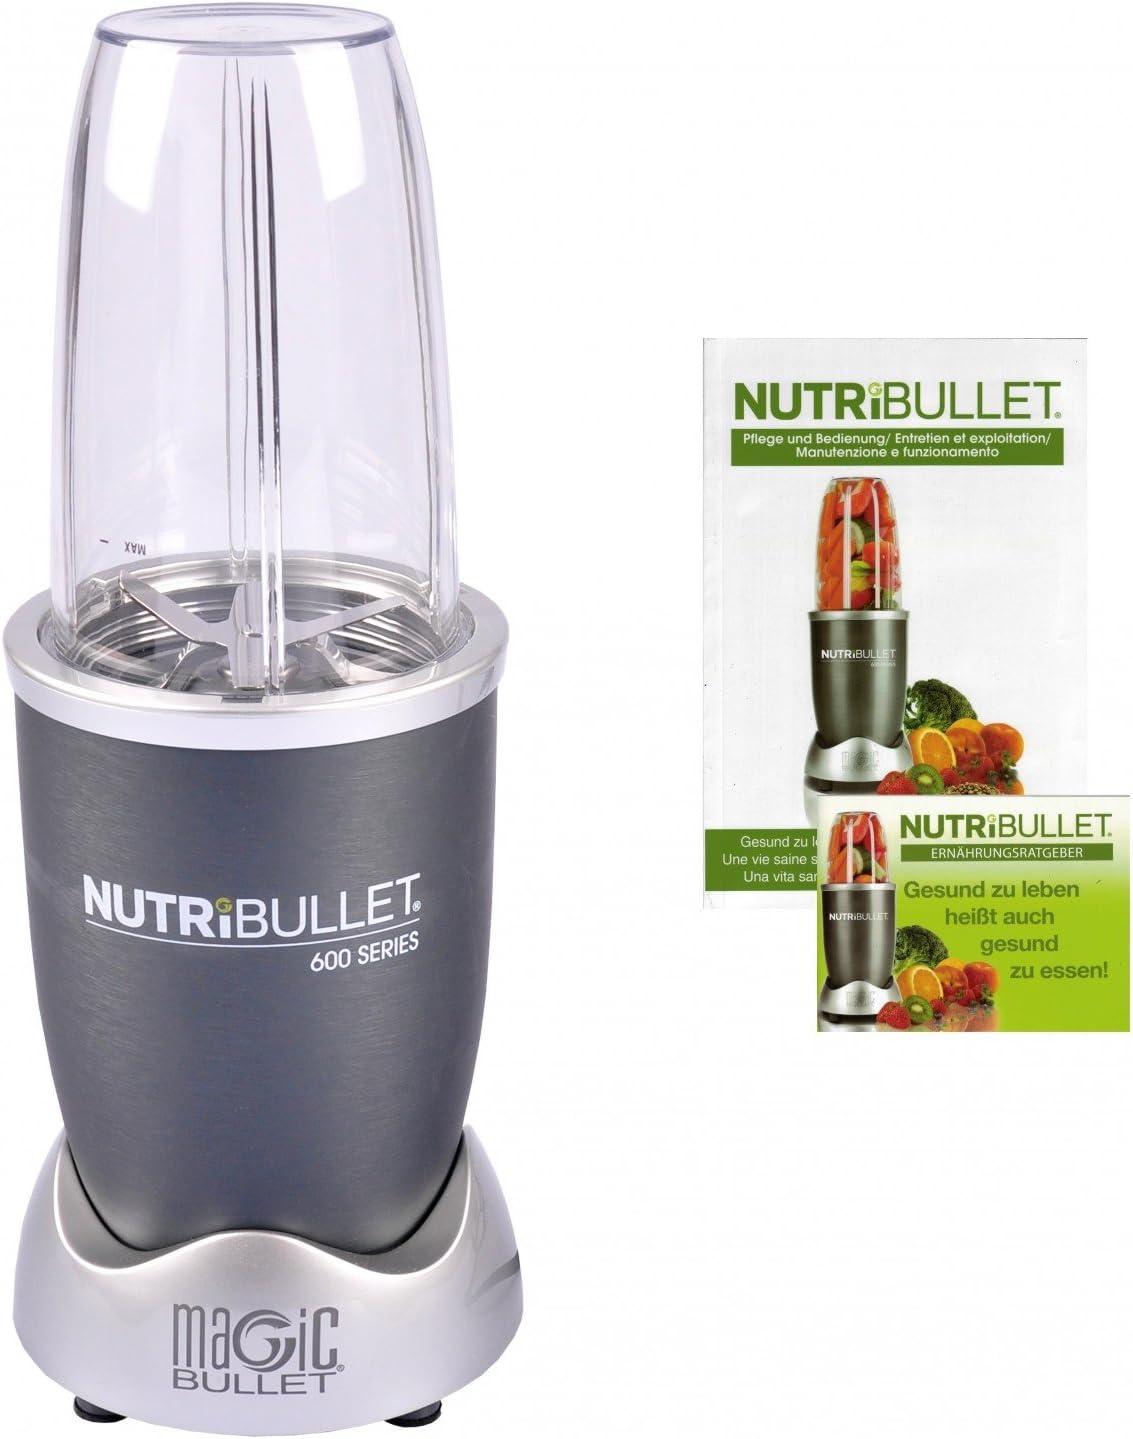 NutriBullet NB 5G Máquina para smoothies, Acero Inoxidable, gris ...